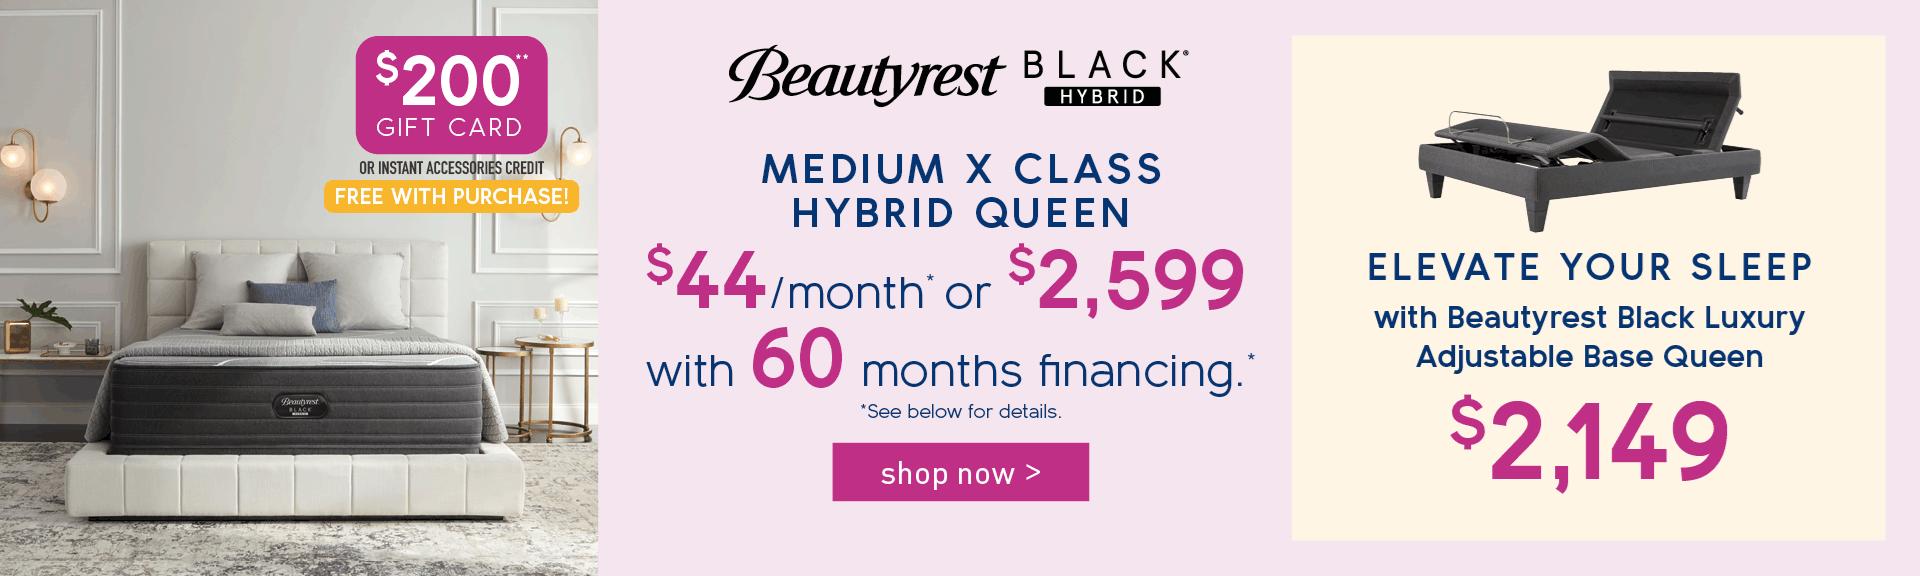 Beautyrest Black Hybrid